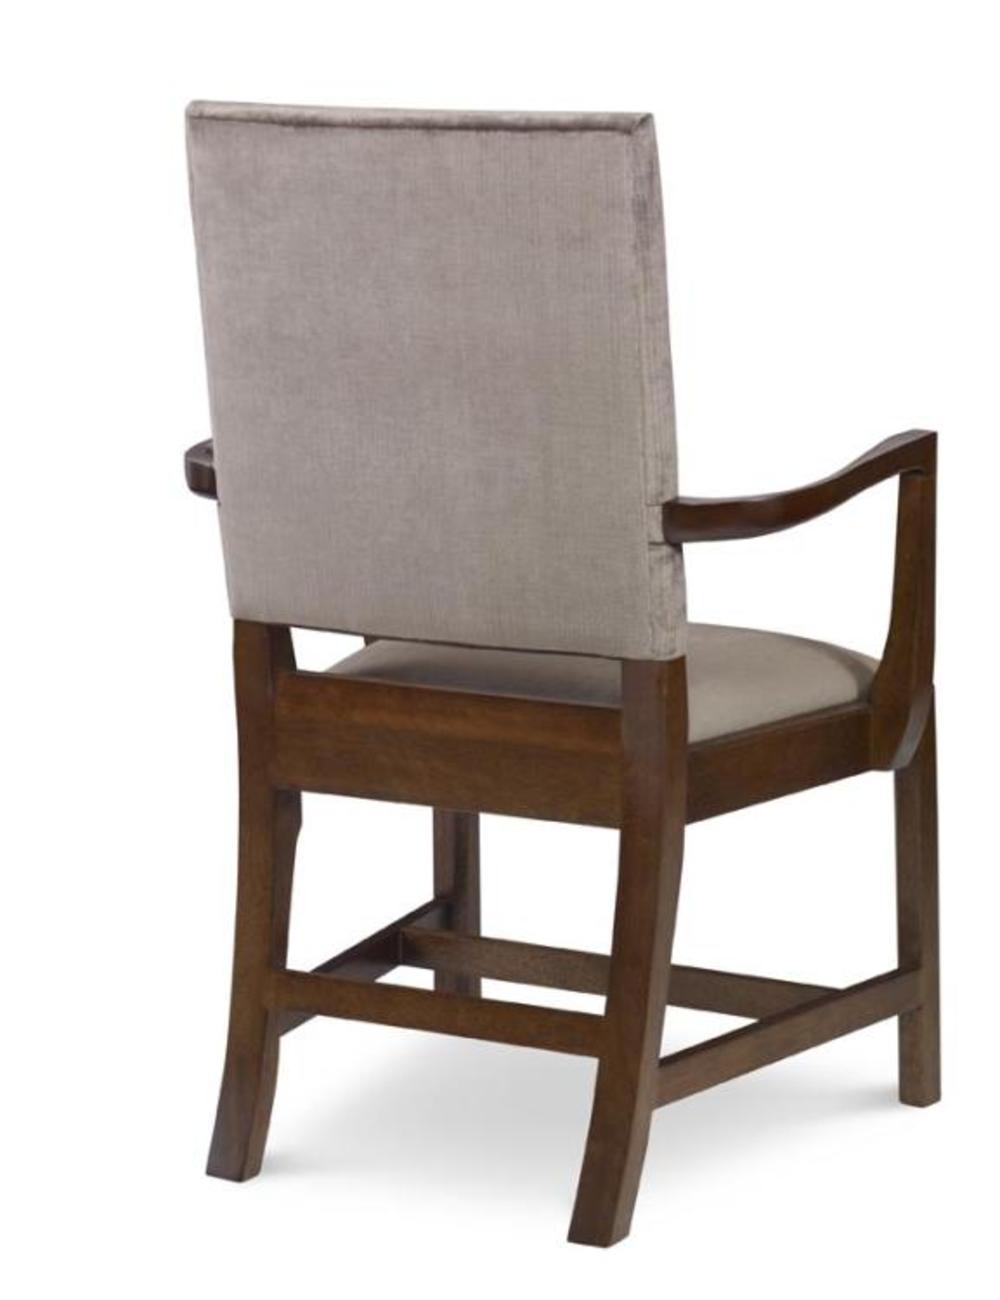 Century Furniture - Emmett Upholstered Arm Chair